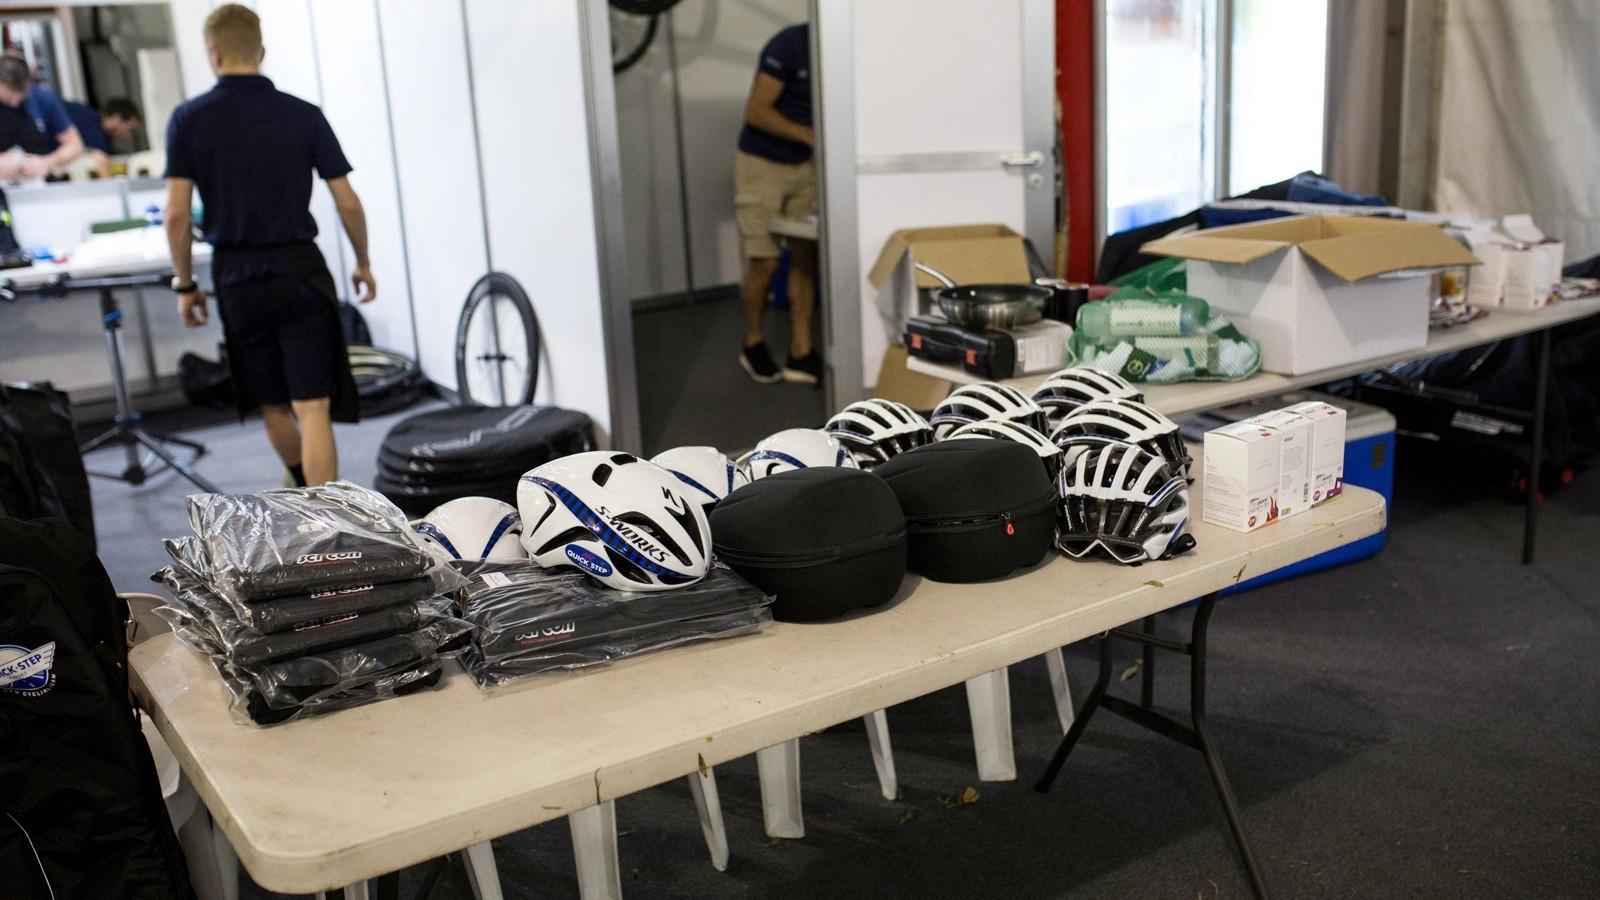 Helmets? Check! Aero helmets? Check? Podium clothes? Check! Street clothes? Check!